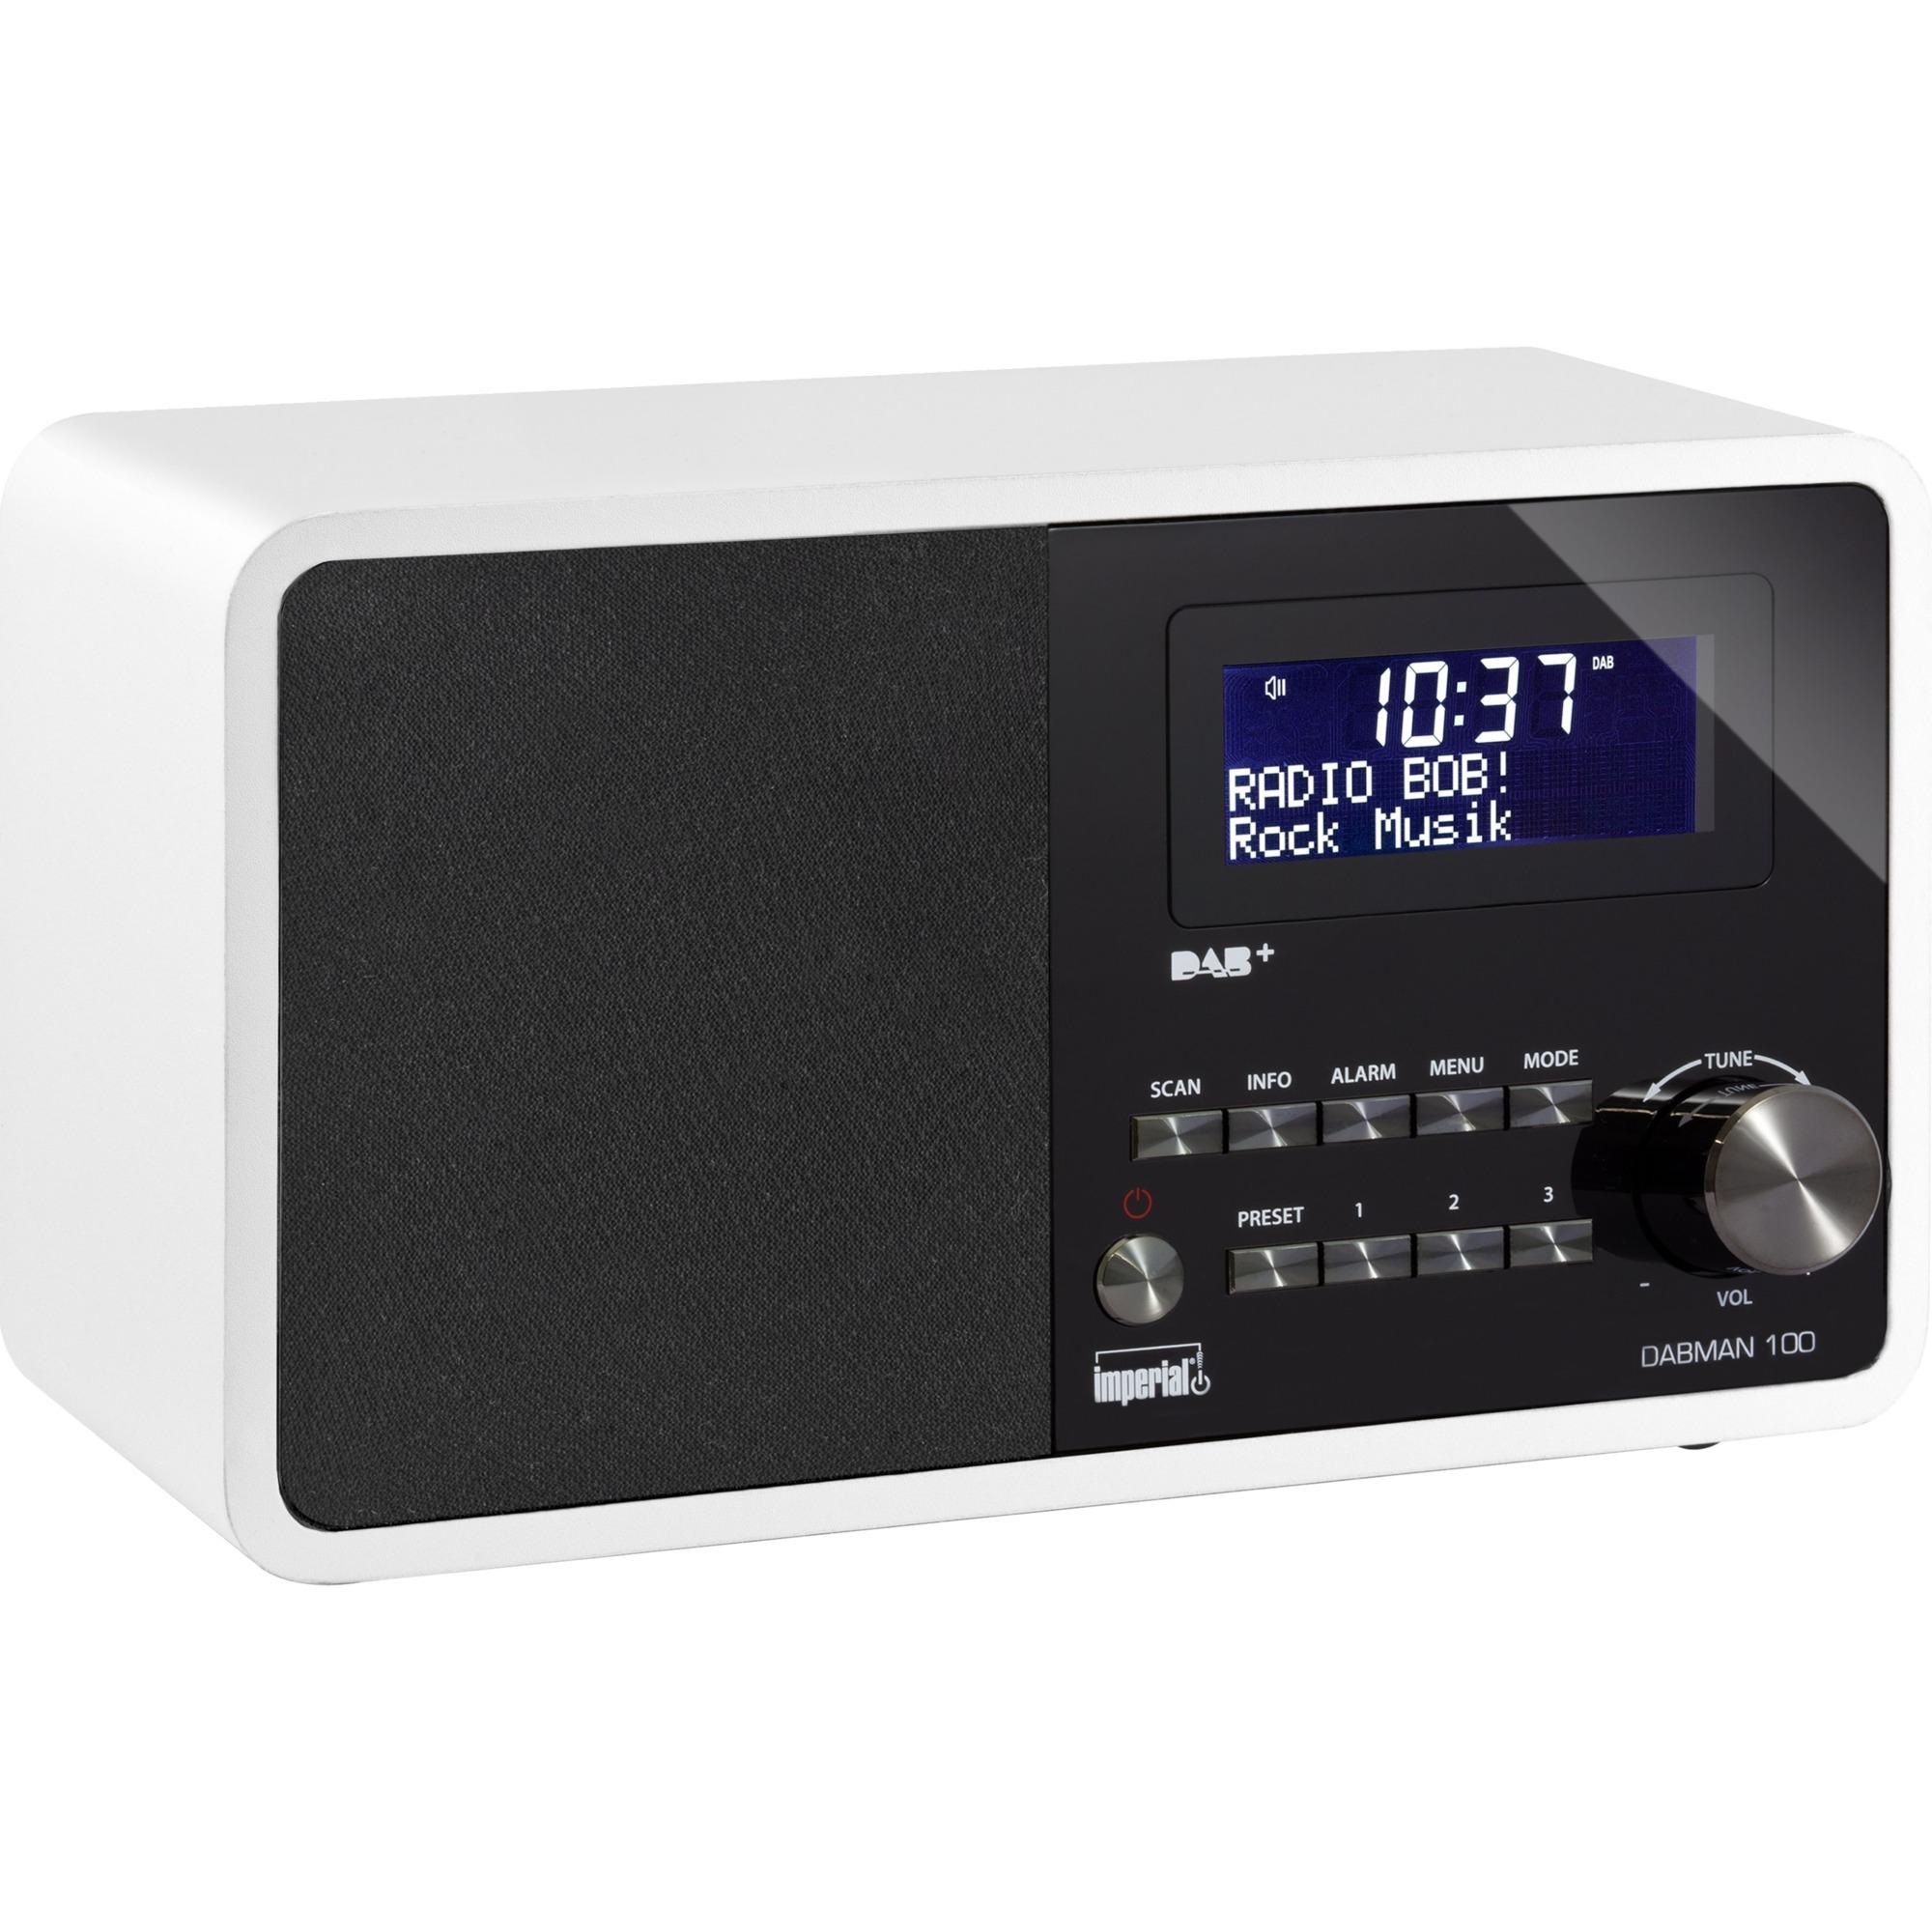 DABMAN 100 Portátil Digital Blanco radio